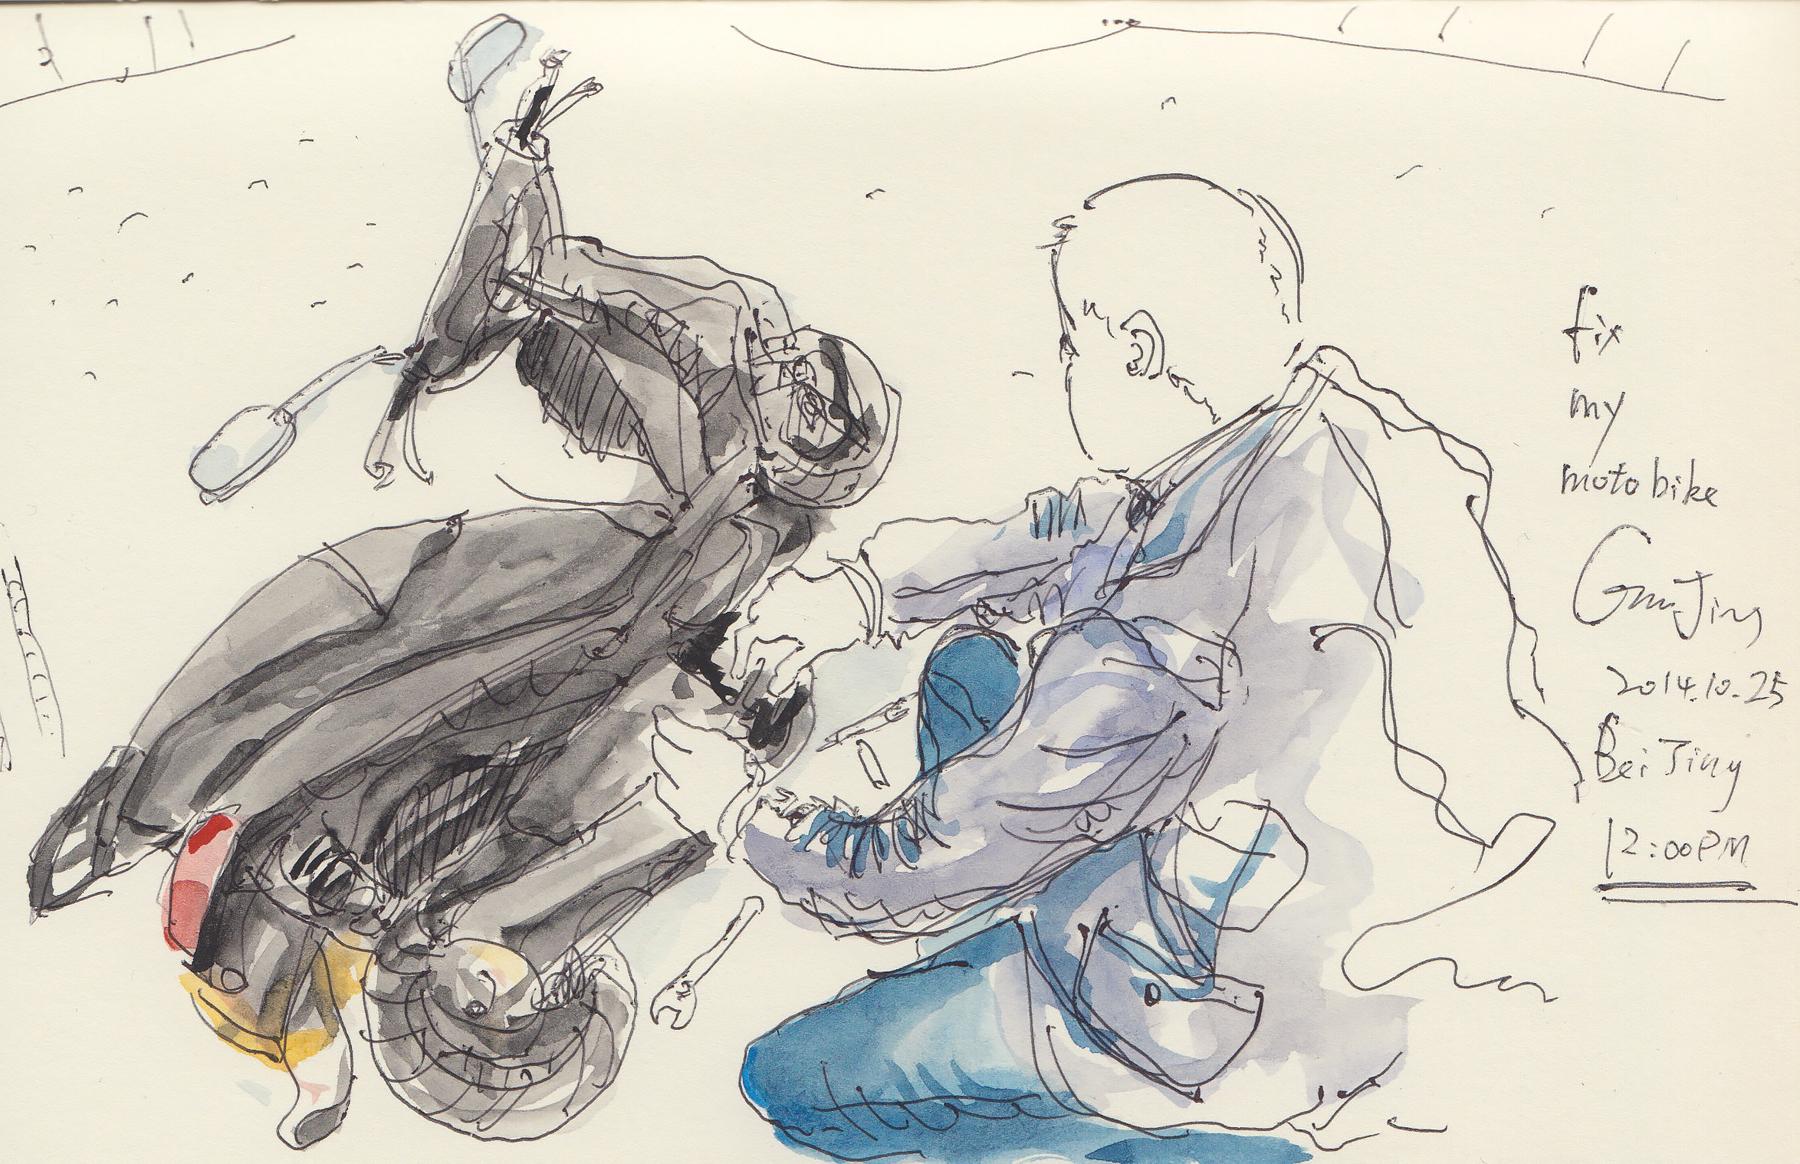 Fix my motorbike